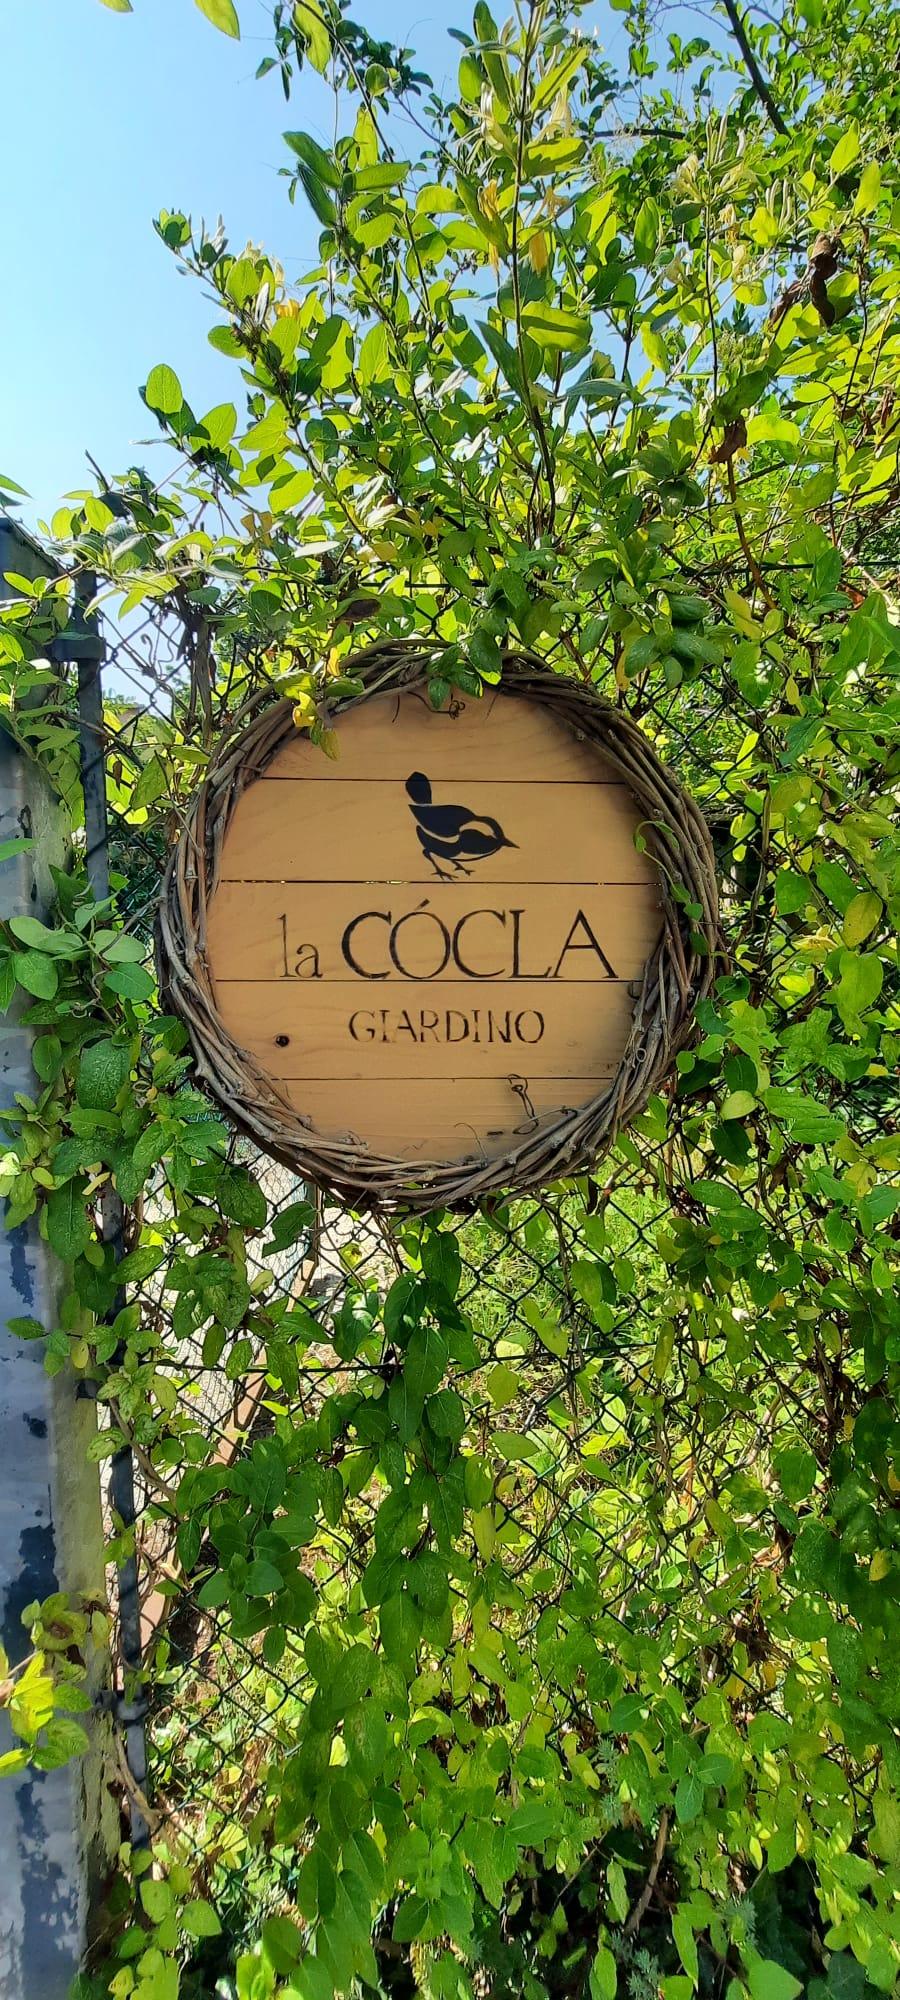 Cocla-13-giu-21-1